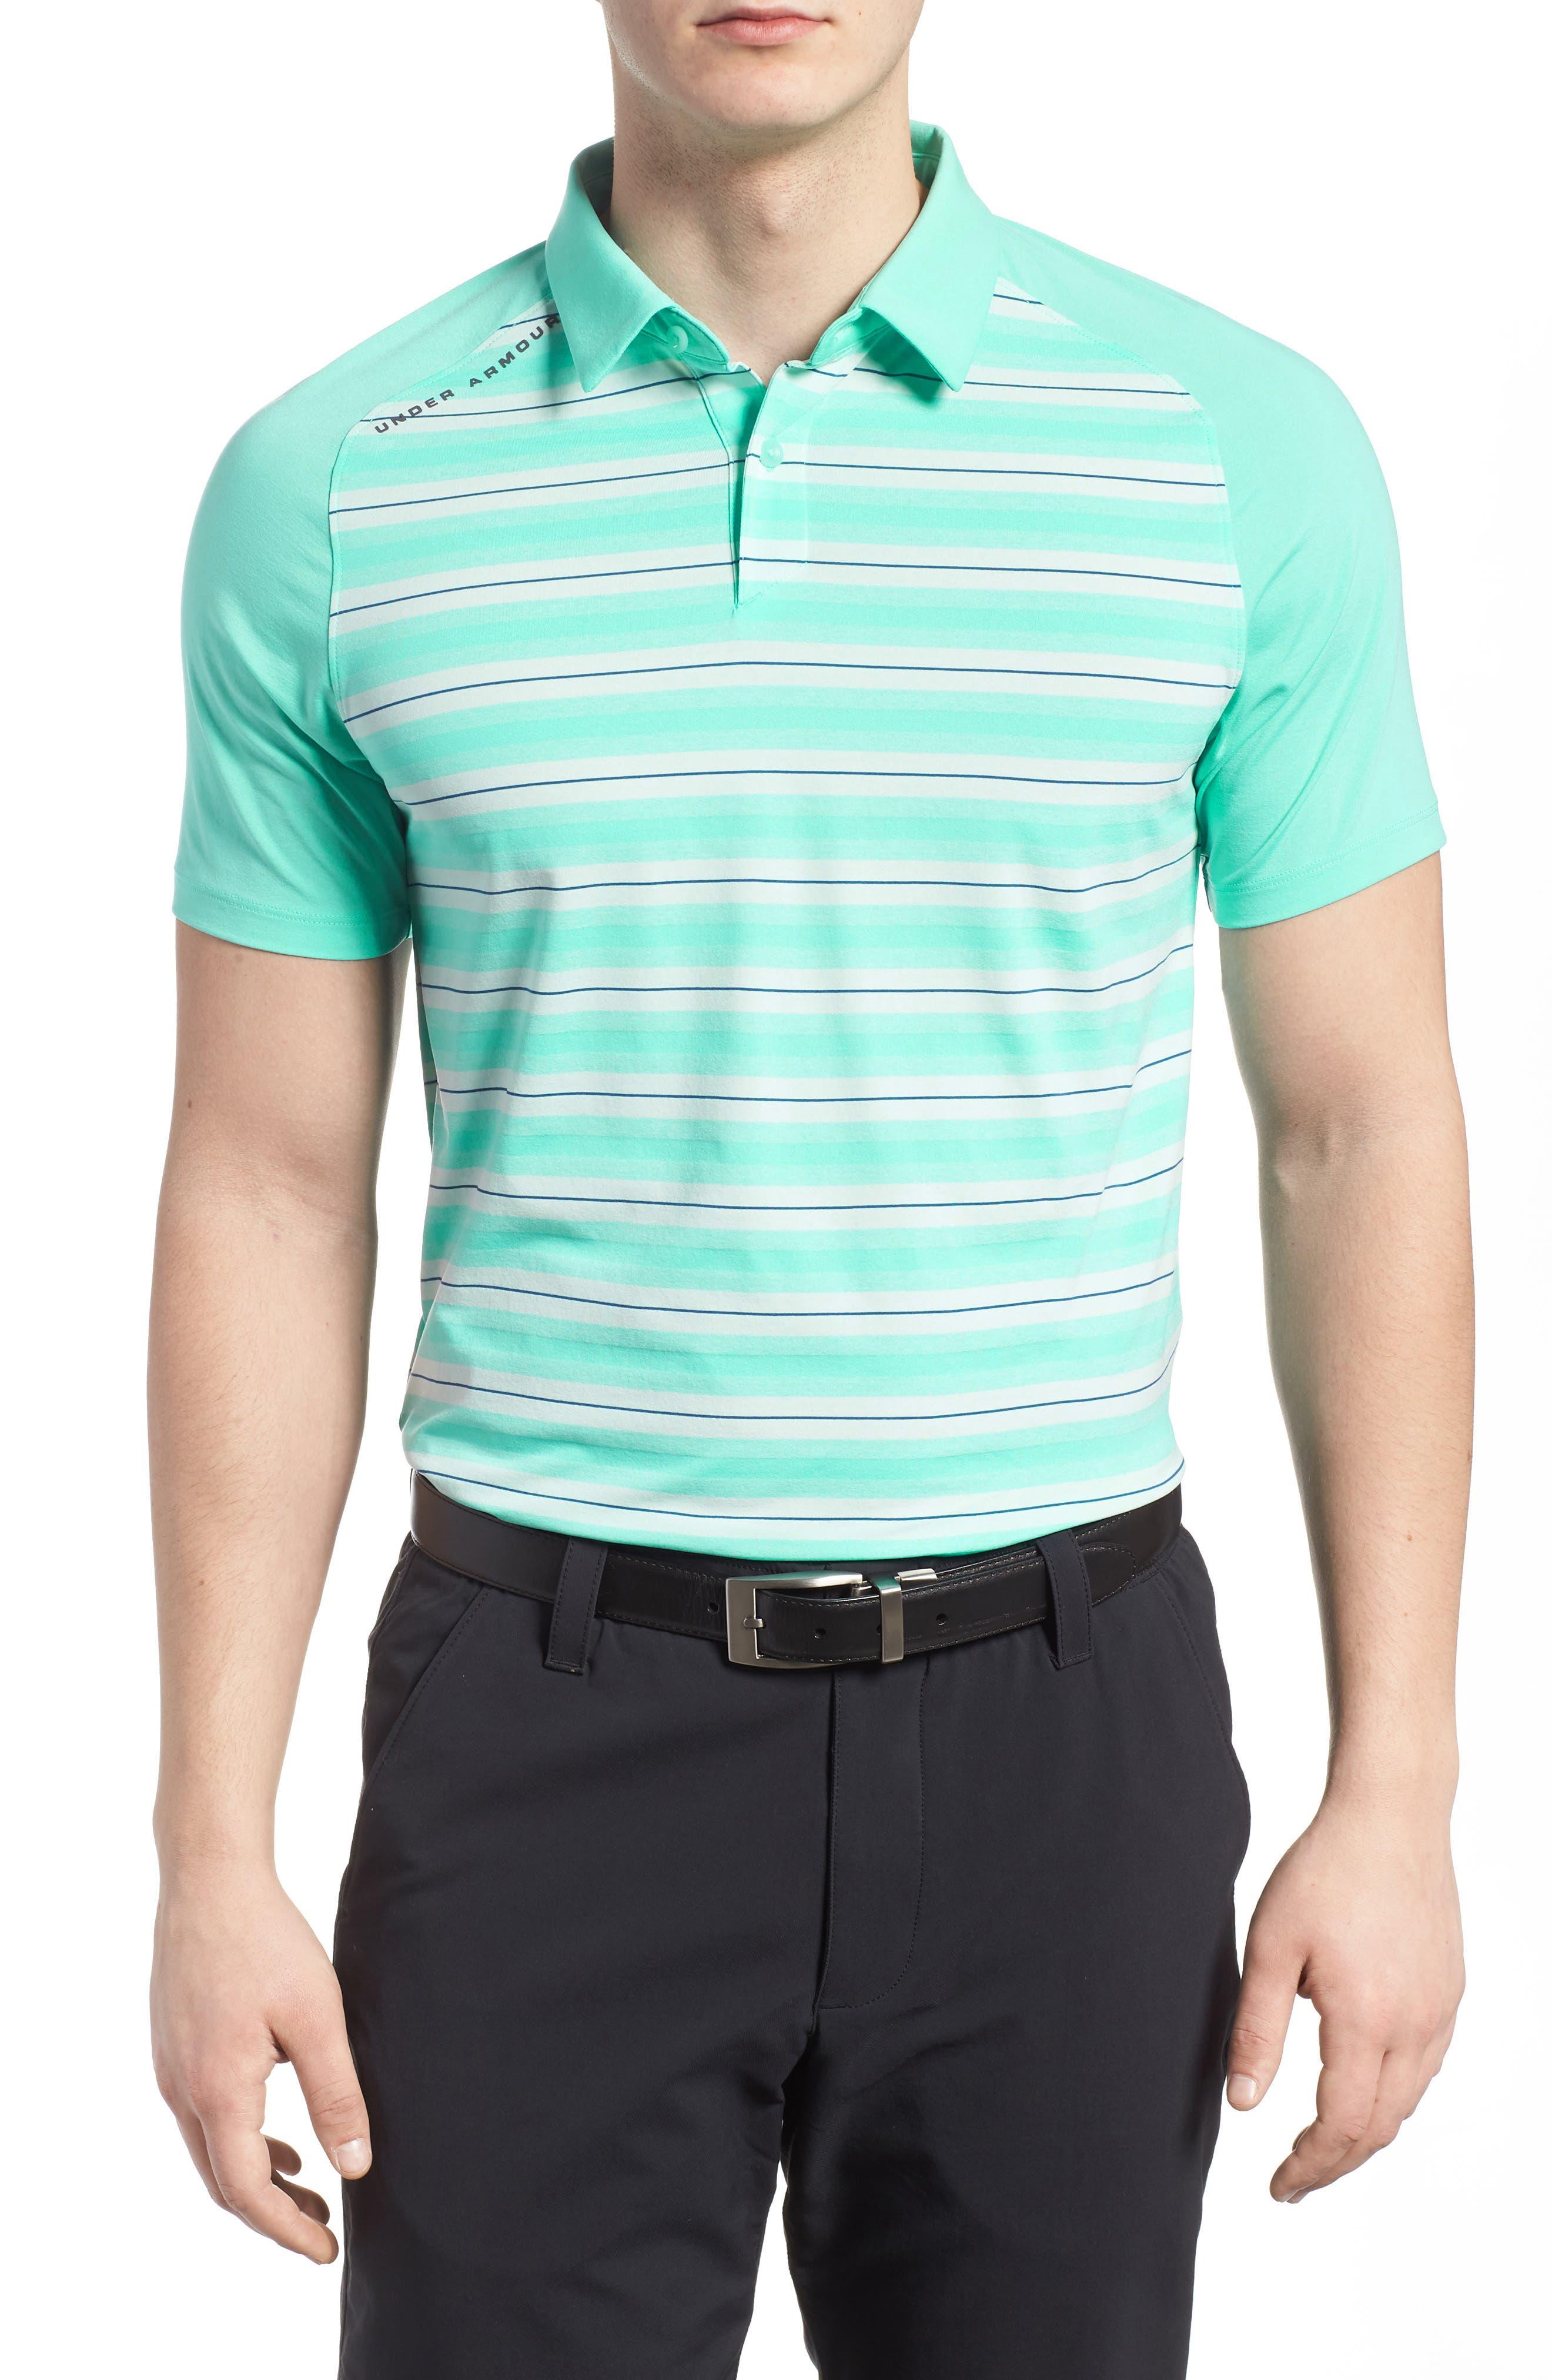 Threadborne Boundless Regular Fit Polo Shirt,                         Main,                         color, 425 Tr Td Tr Td Md Htr Rno Gry